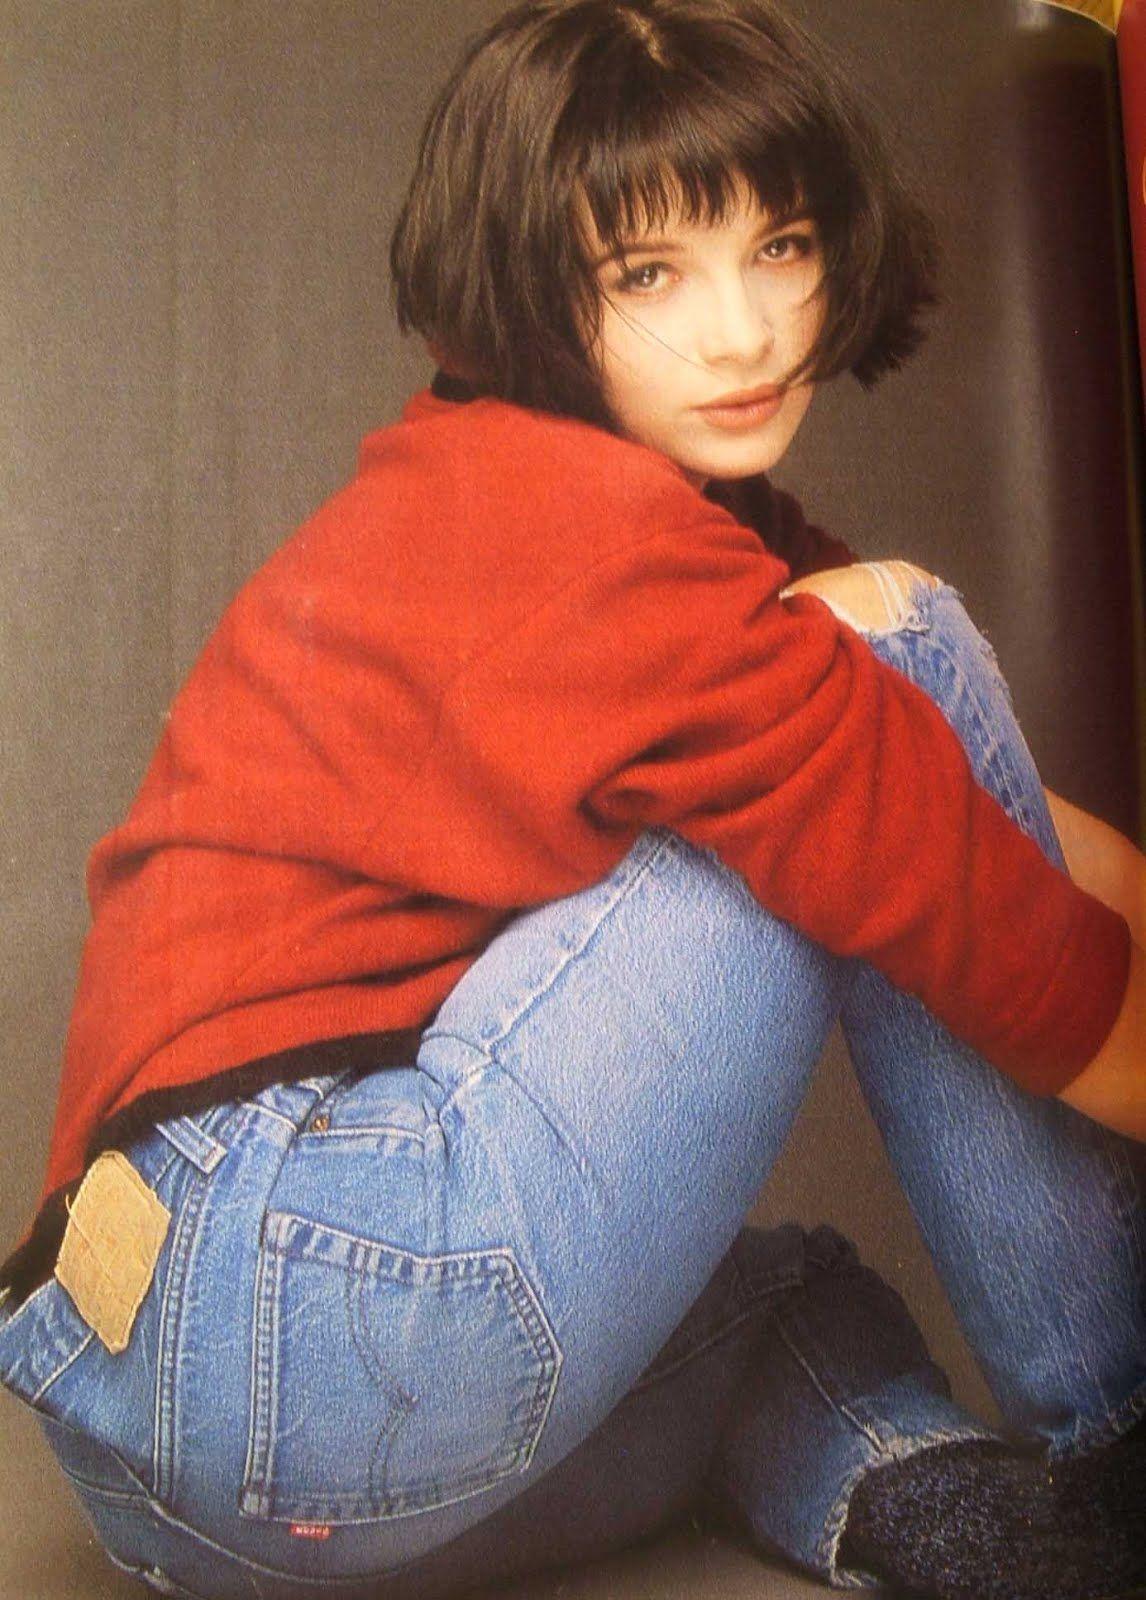 Juliette Binoche Elle Magazine 1986 Adorn In 2019